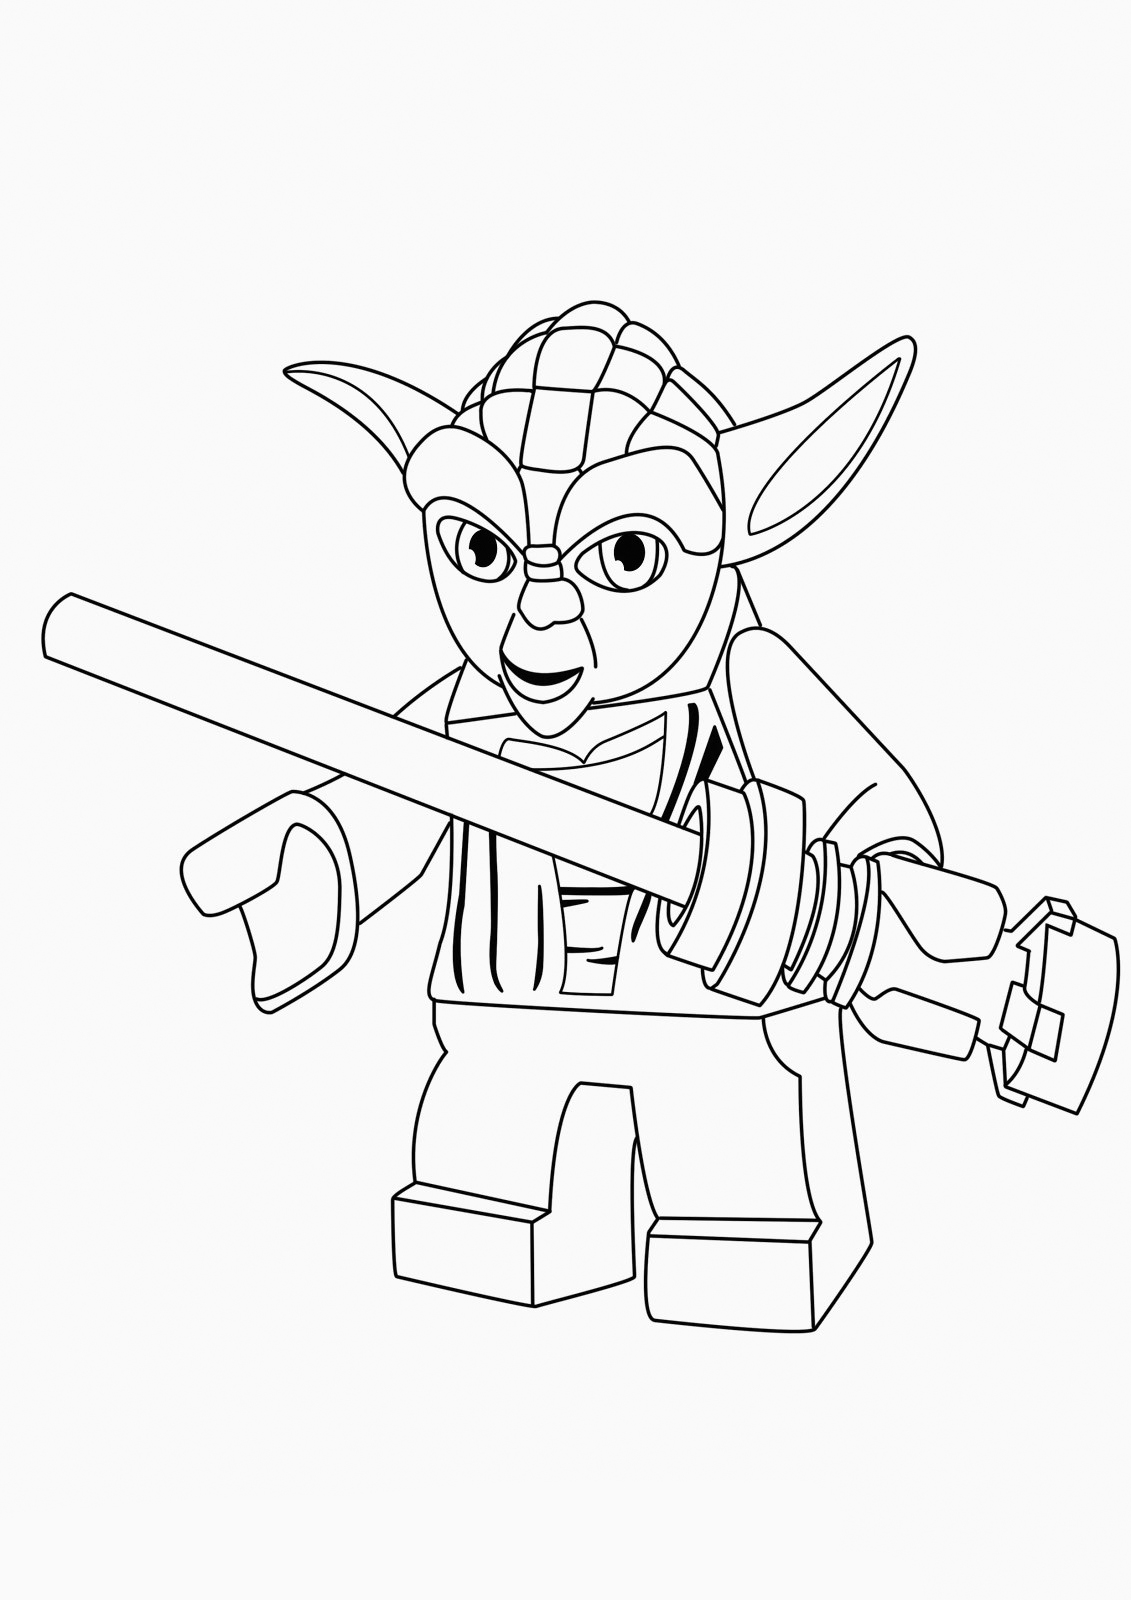 STAR WARS Coloring Page – Yoda   Vanquish Studio   1600x1131